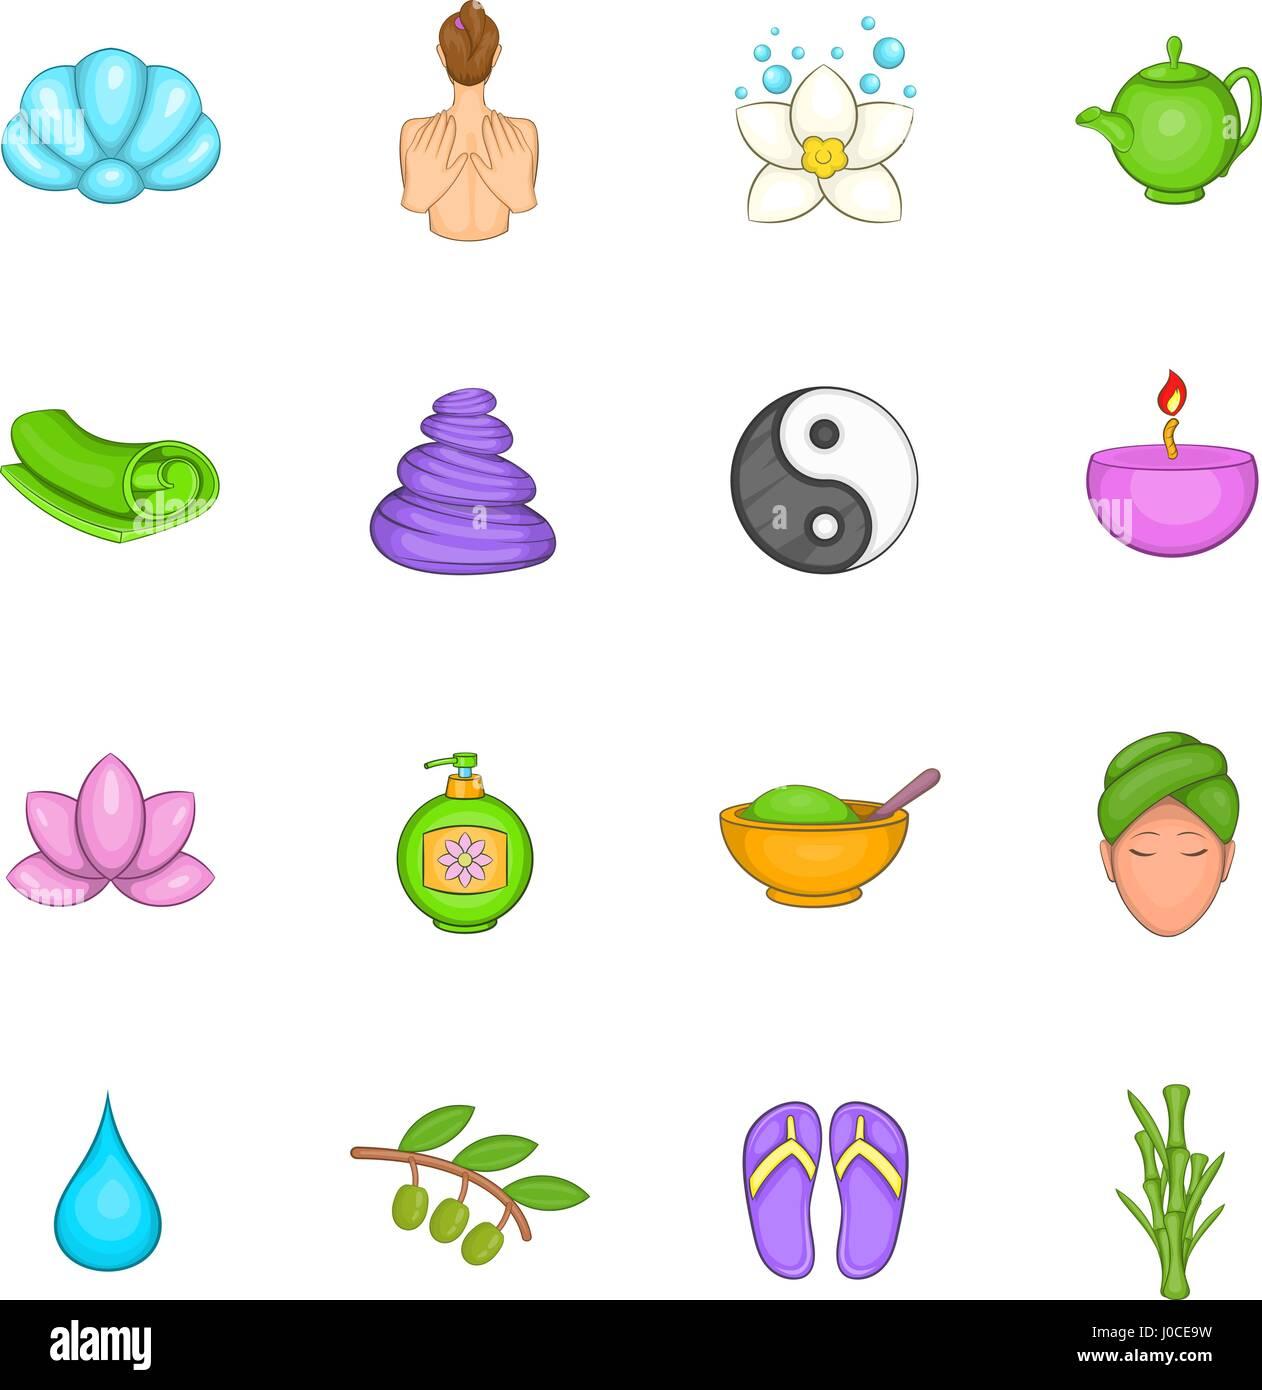 Wellness Zen Natural Spa Icons Stockfotos & Wellness Zen Natural Spa ...